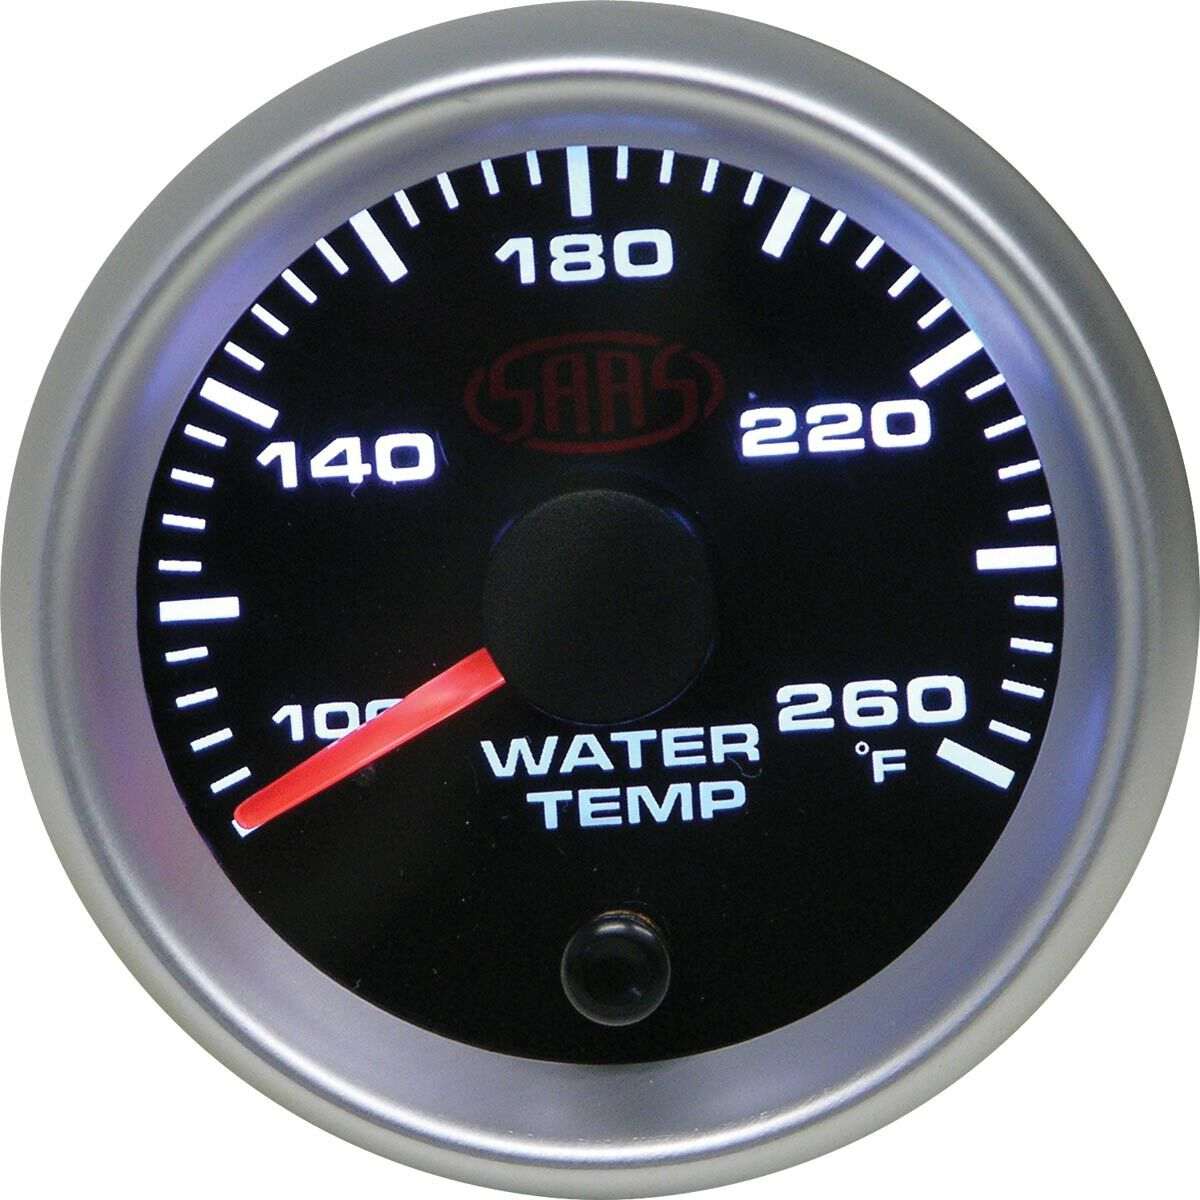 fpv gauge wiring diagram digital thermostat gauges accessories supercheap auto saas water temperature black 52mm scaau hi res